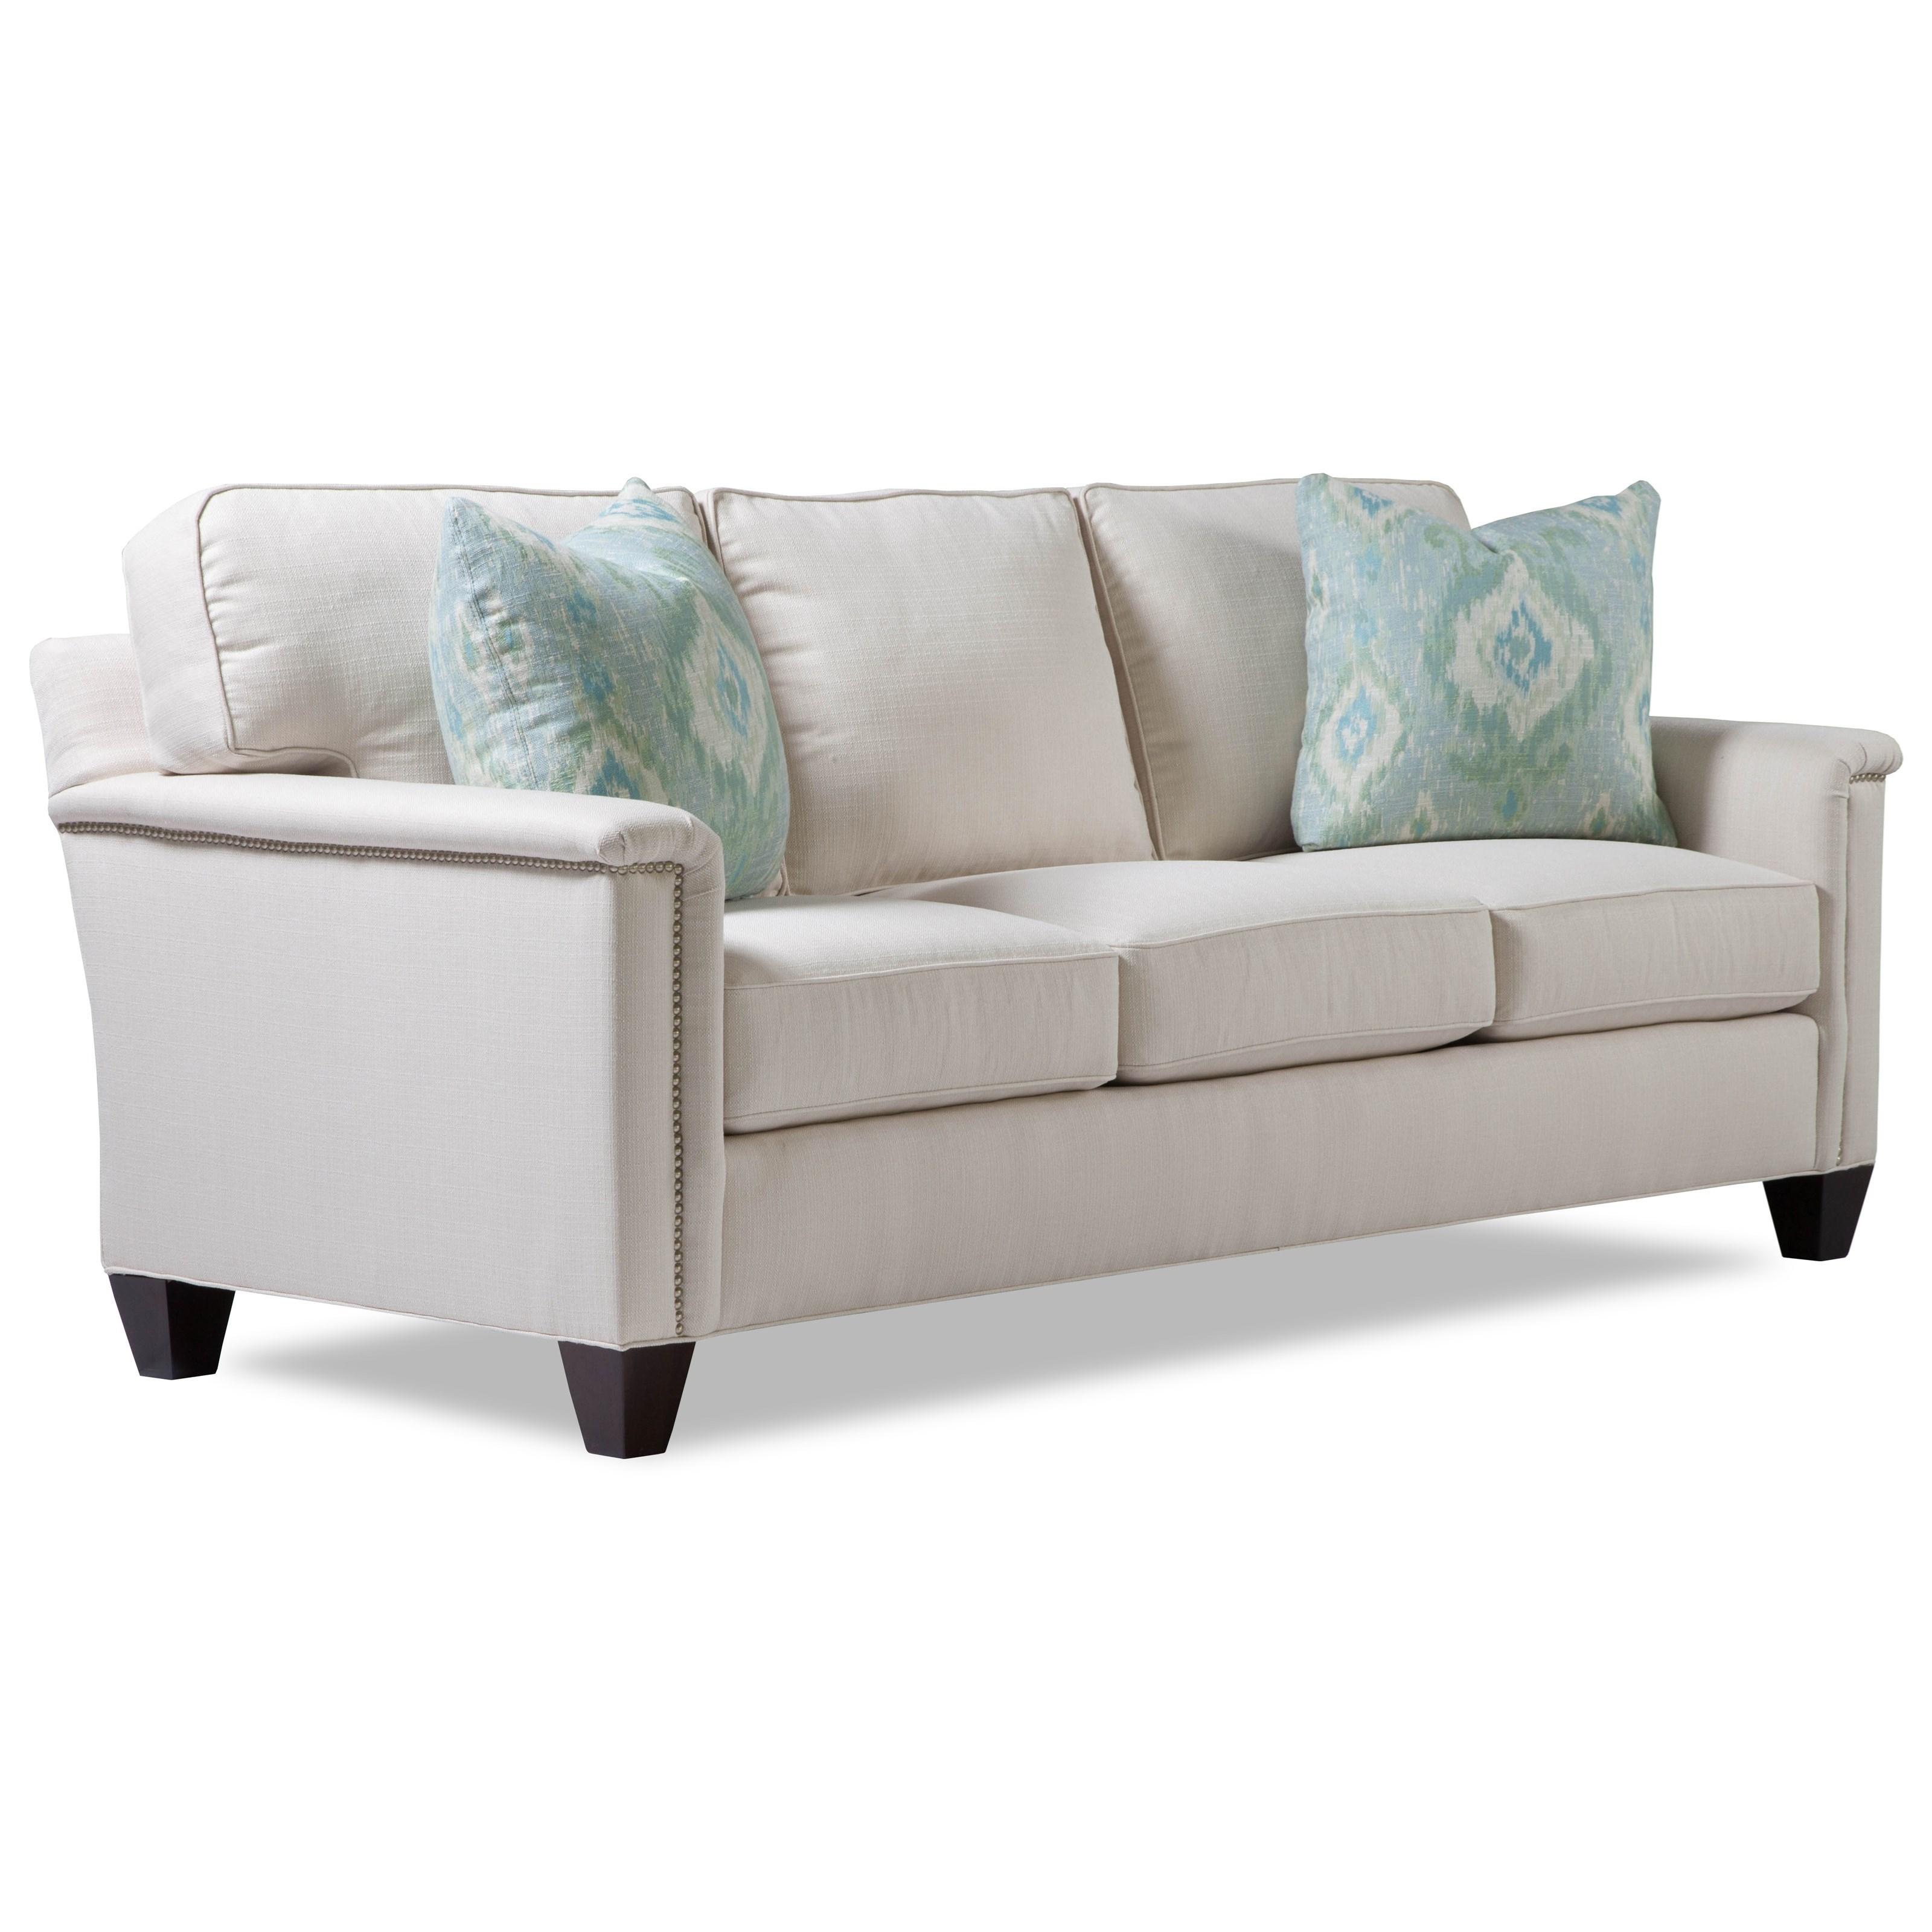 Huntington House 2042 2042 20 Customizable Three Seat Sofa ...